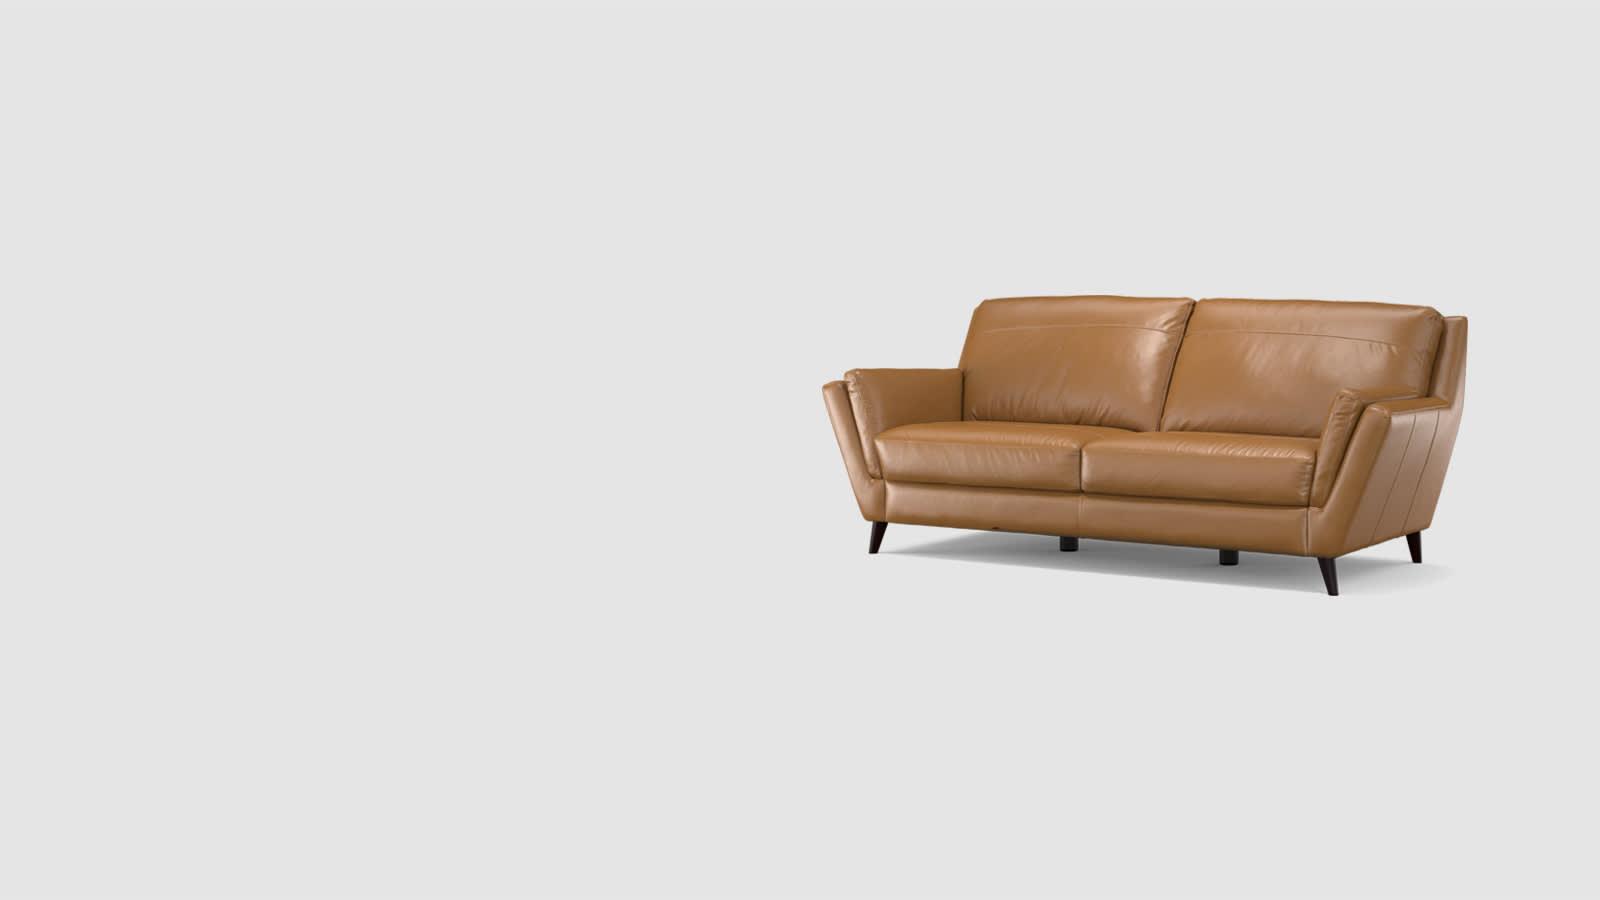 Sofology Fellini Industrial Leather Sofa